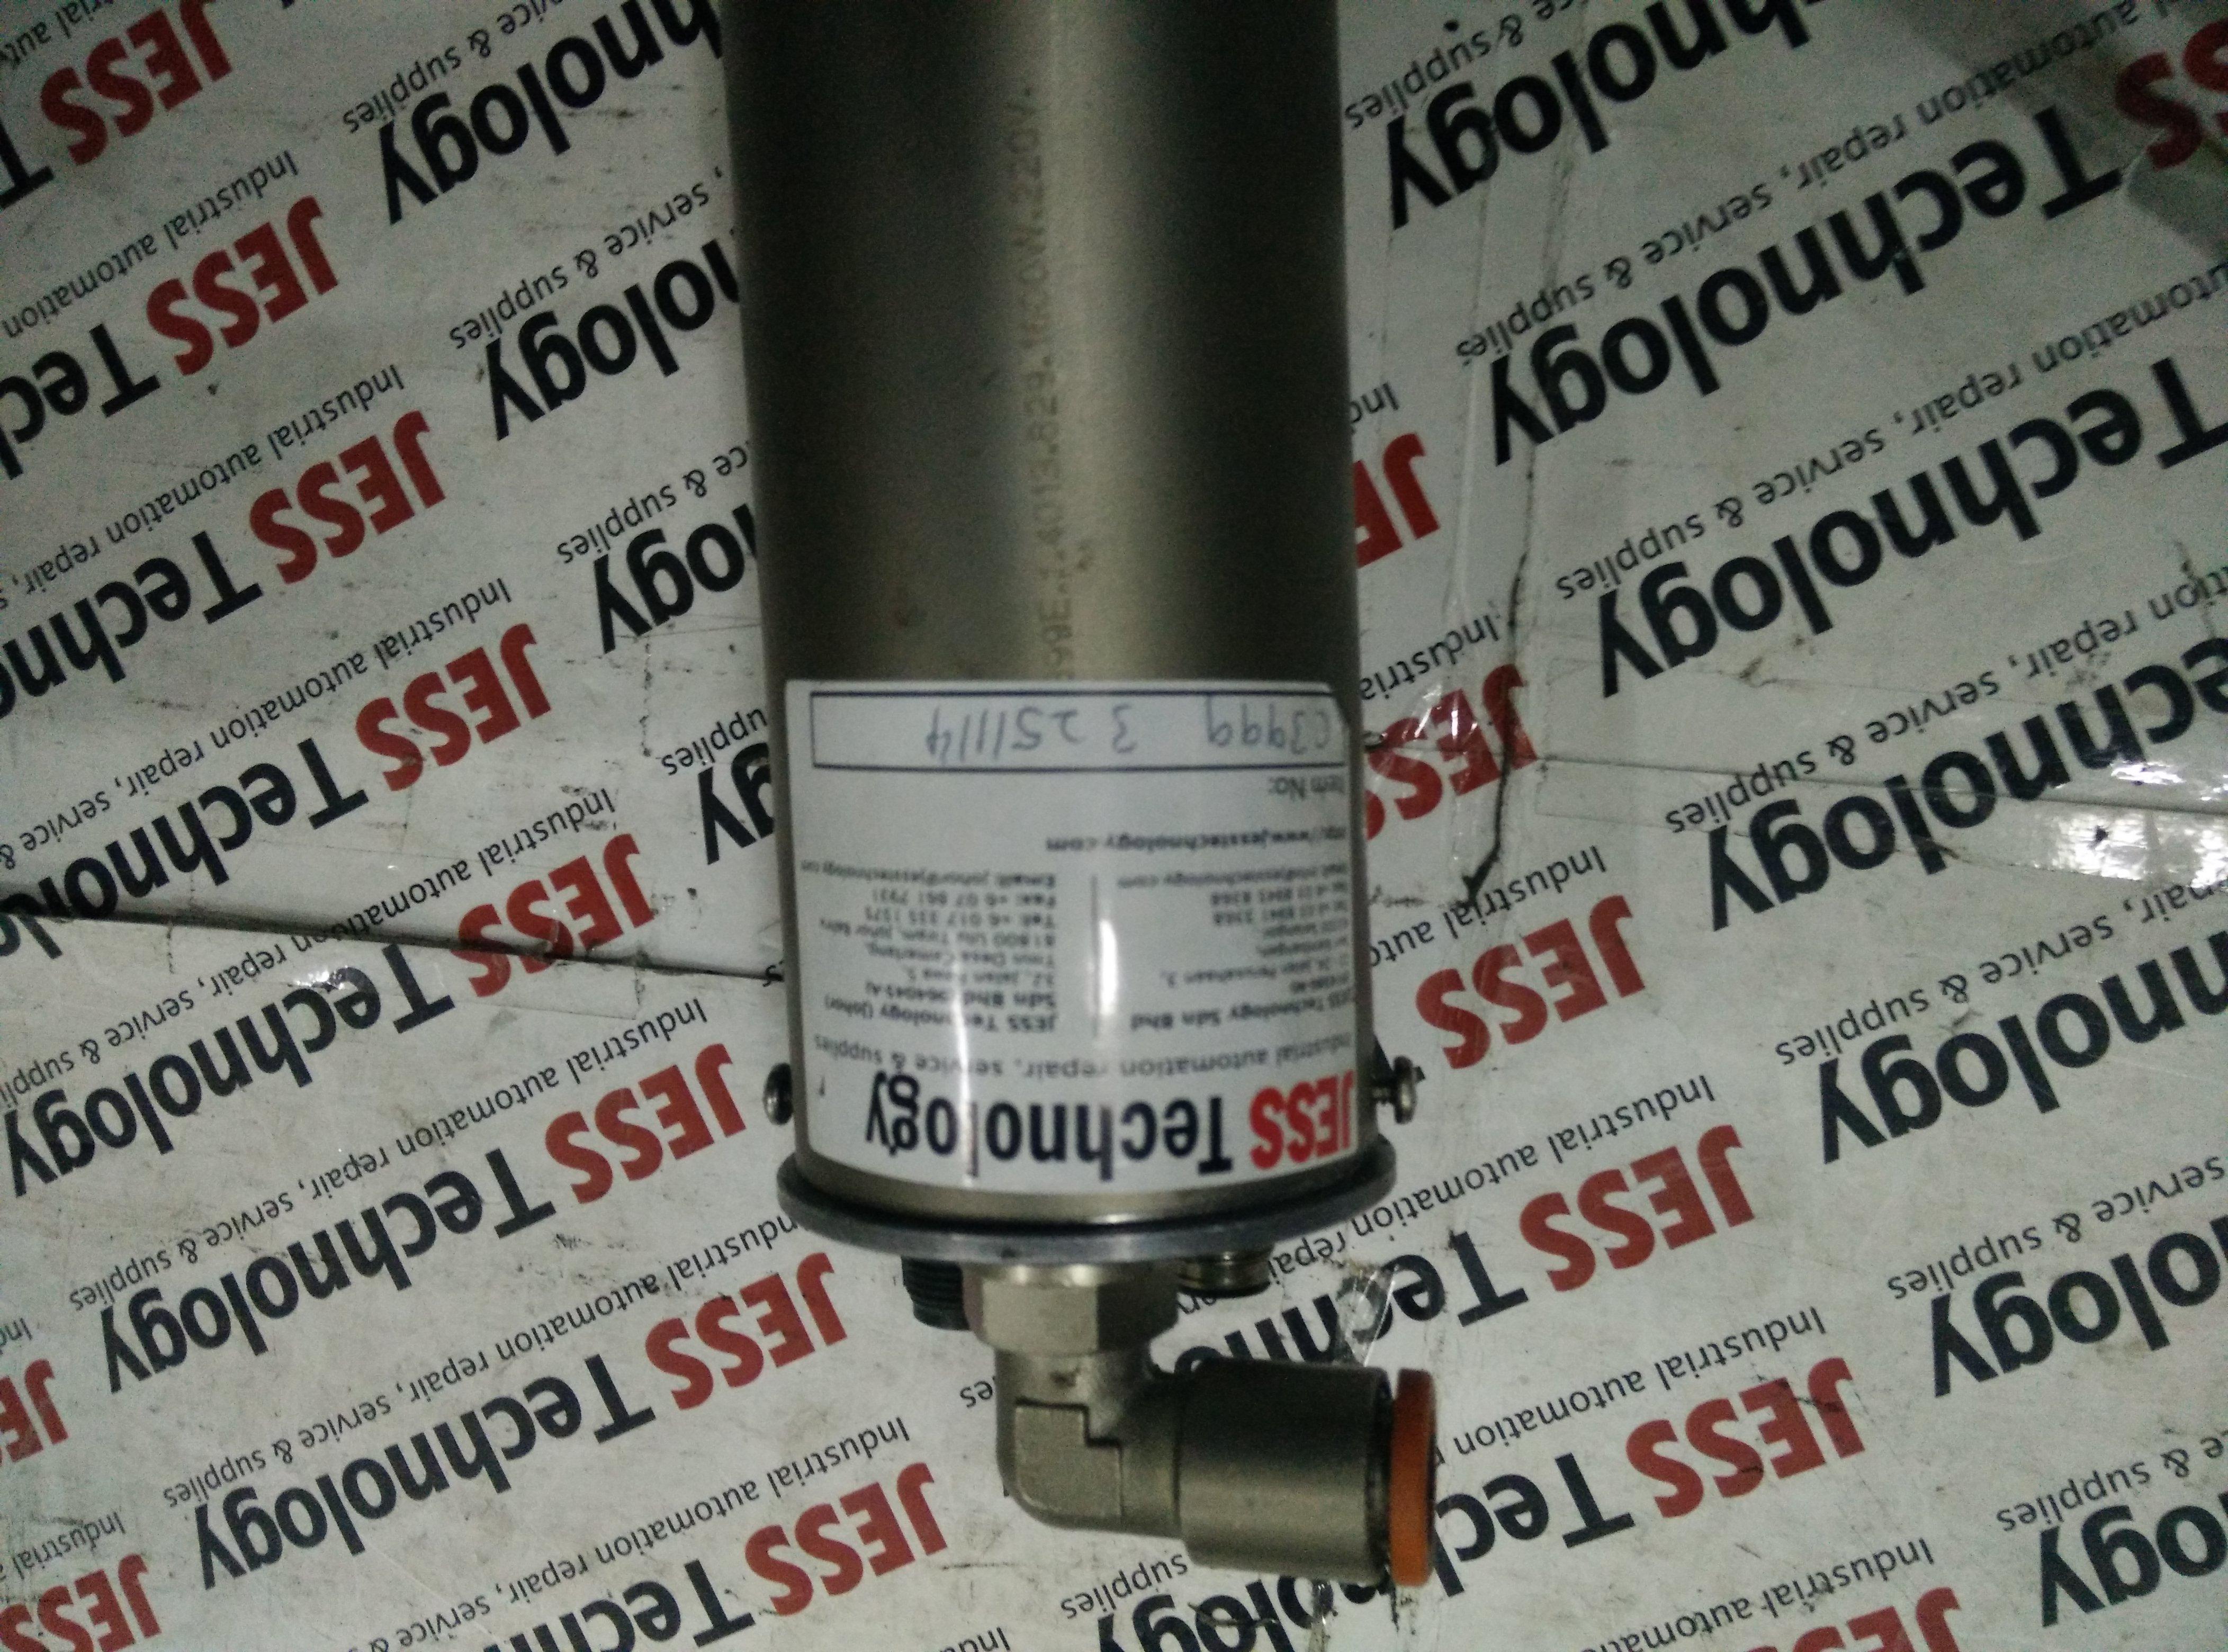 Repair COD.40065972 00 GUN CONDITIONING HEATER GUN in Malaysia, Singapore, Thailand, Indonesia